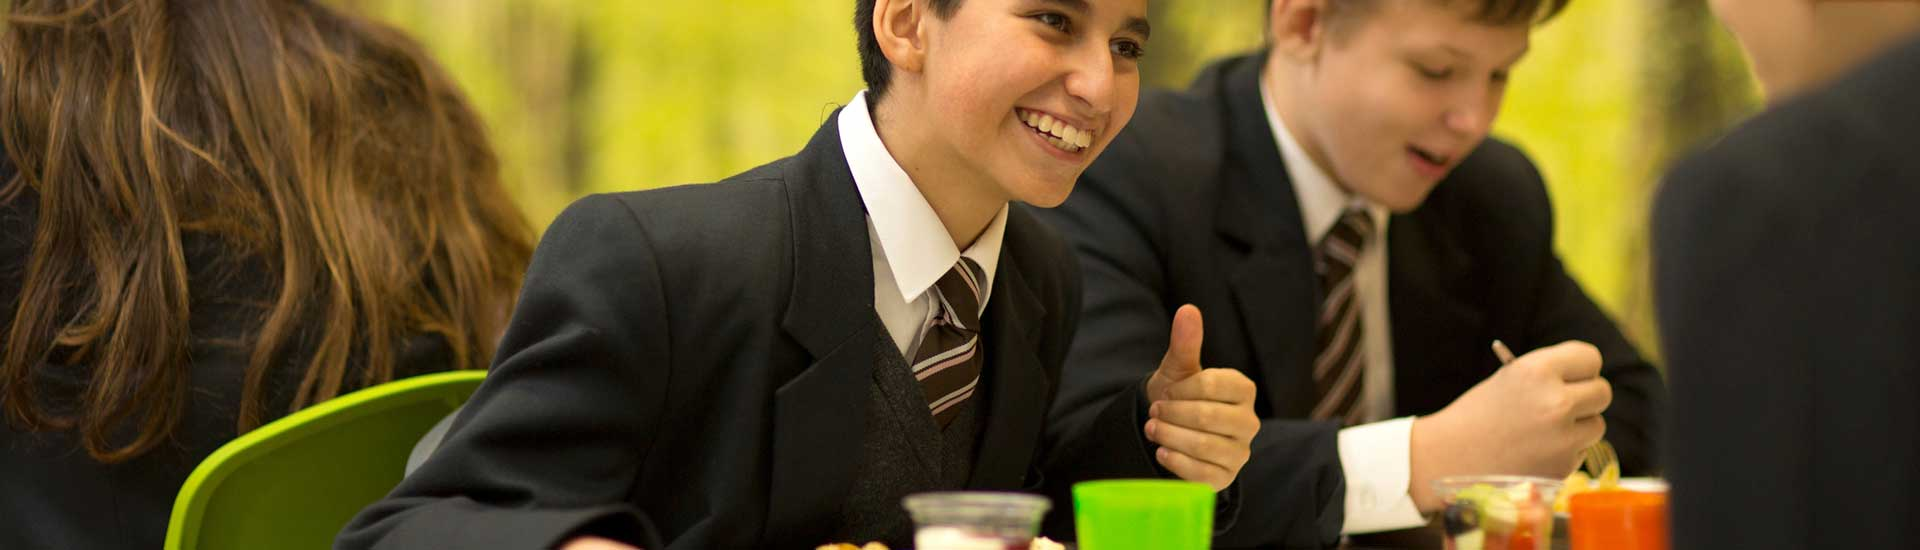 International - School meals